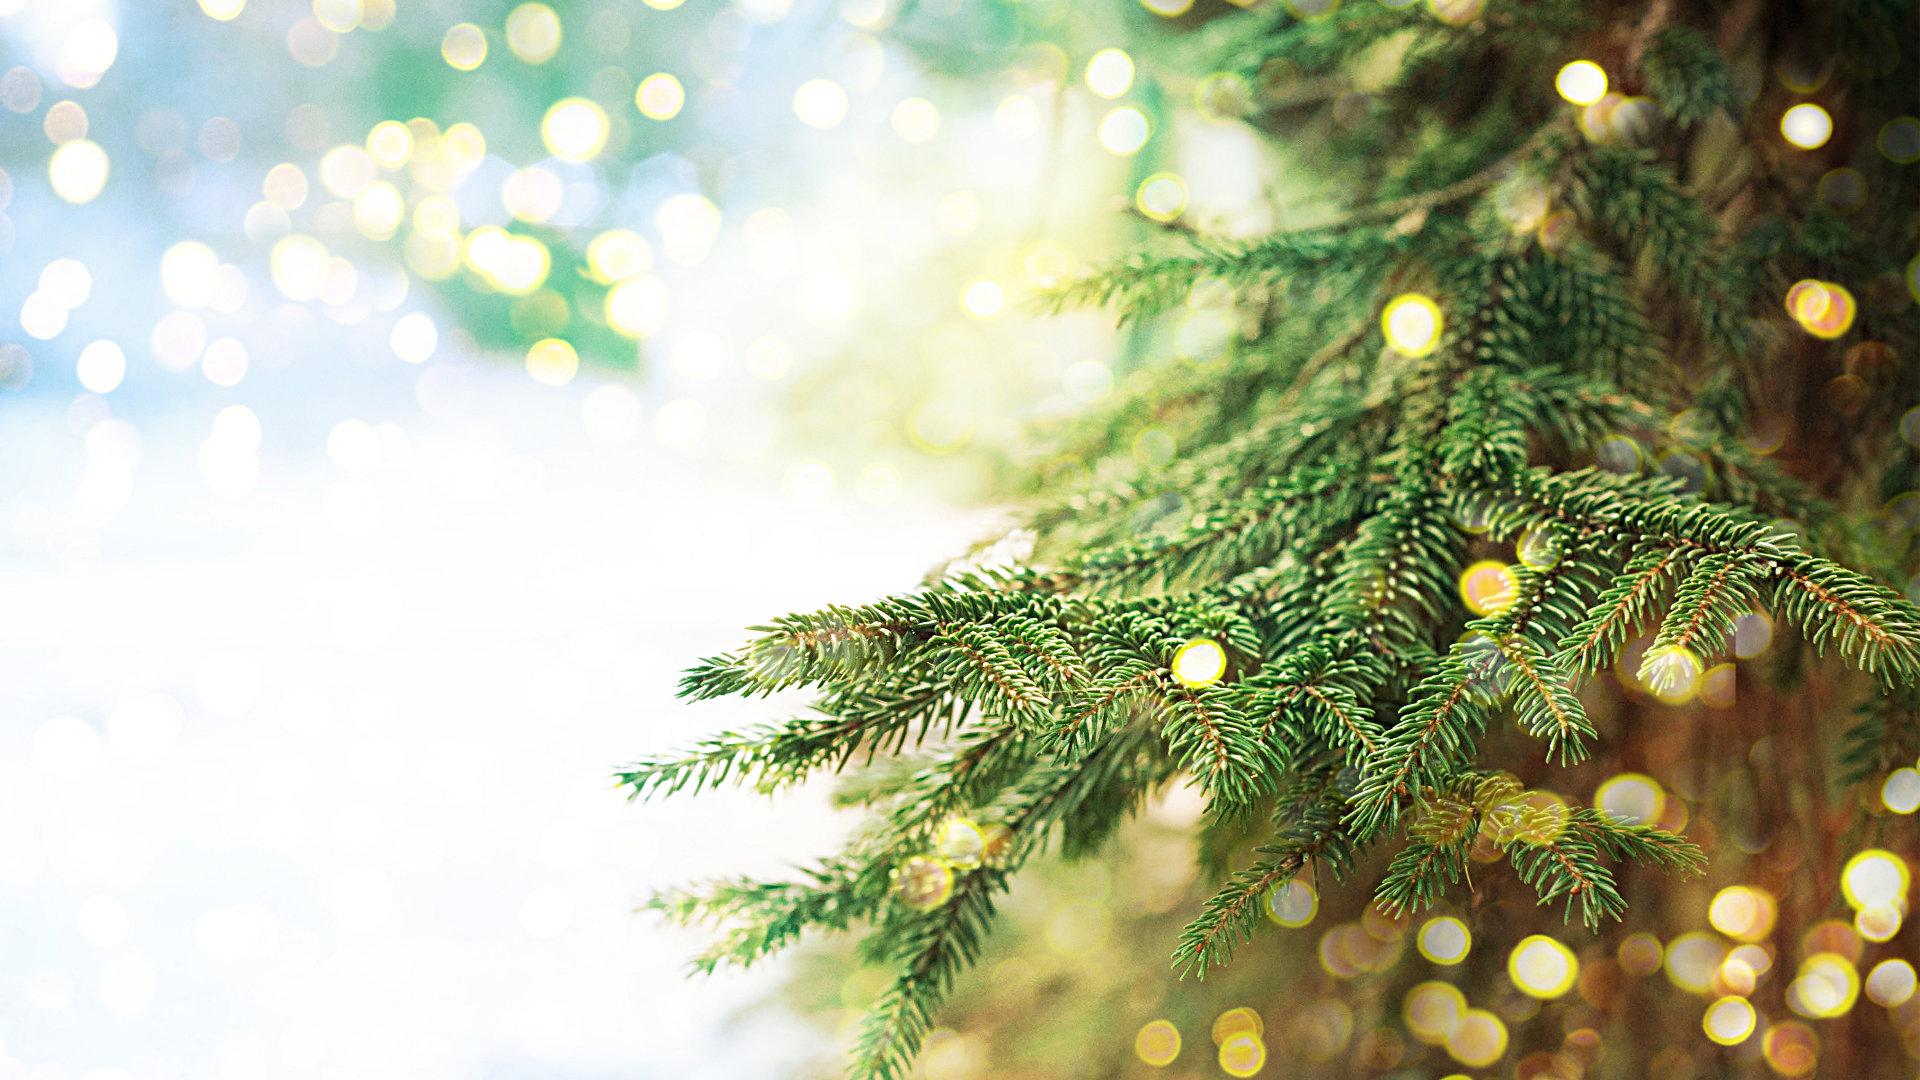 how to decorate a christmas tree mygeektime - Christmas Tree Lights